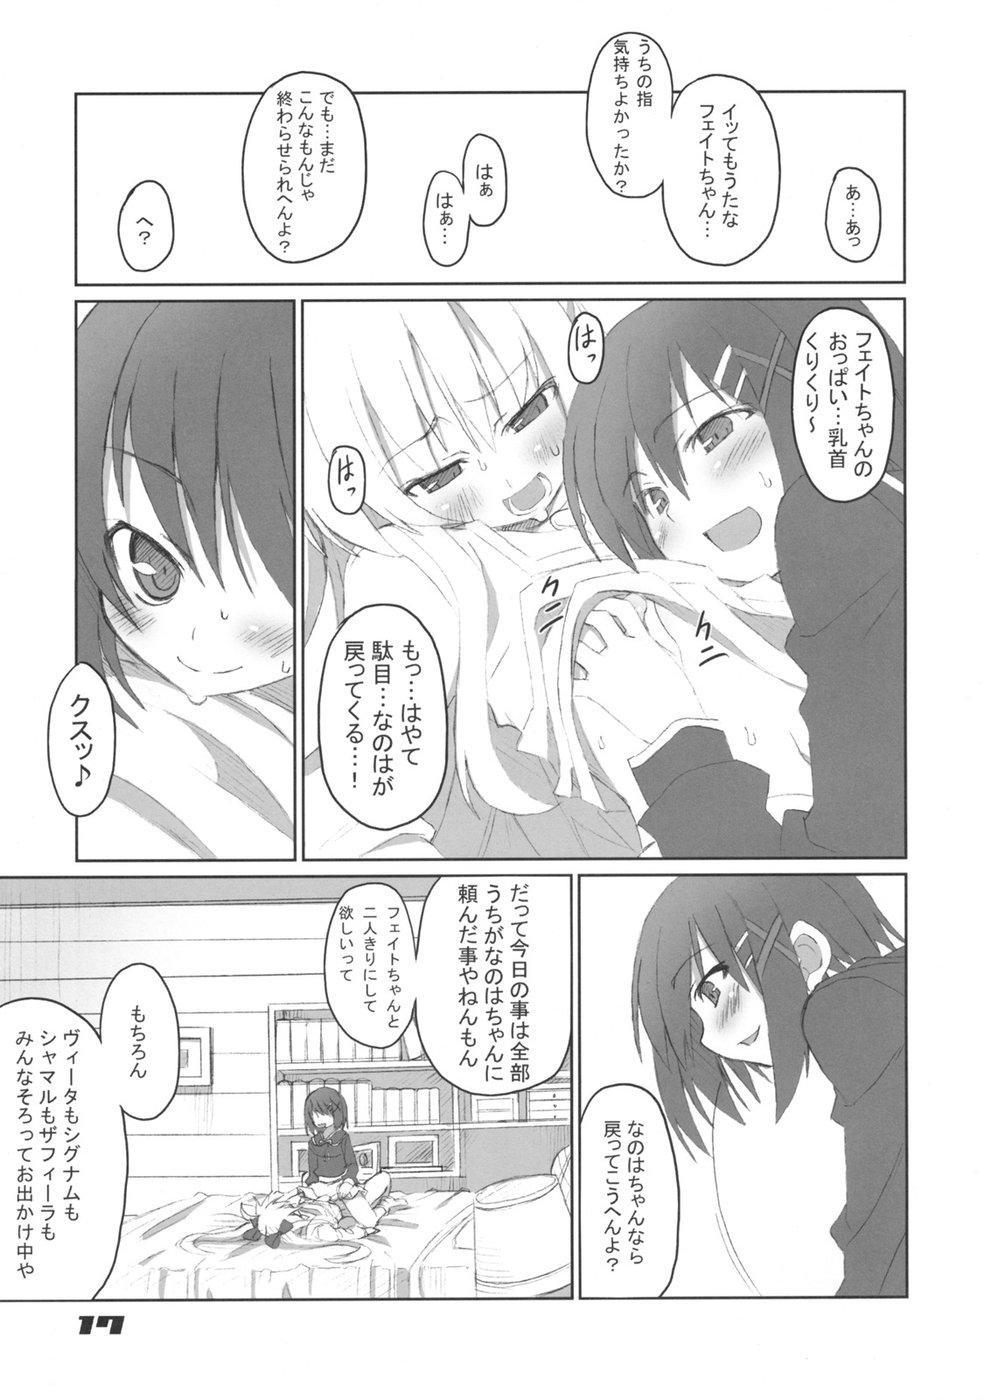 Fate-chan Igai to Moroi no A's 16